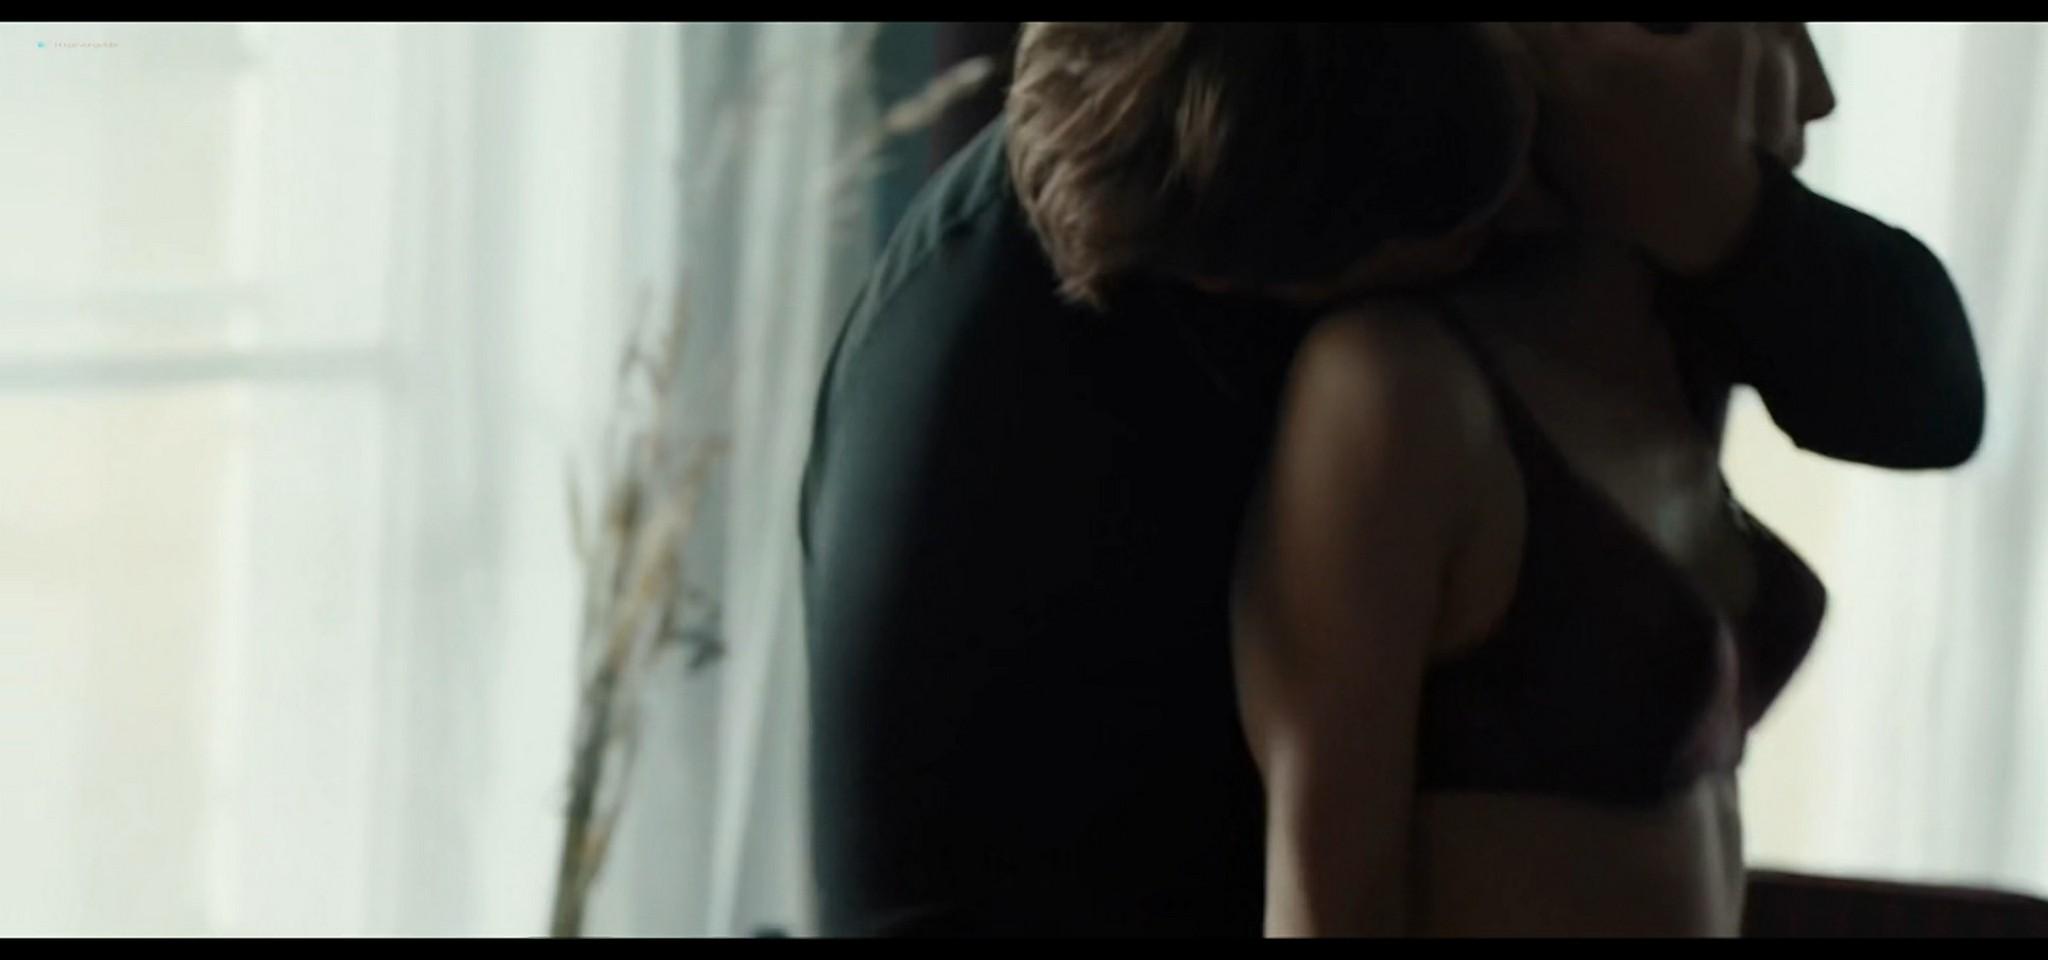 Yulia Snigir hot and some sex Anna Chipovskaya, Yuliya Peresild sexy - The End of the Season (2019) HD 1080p Web (8)